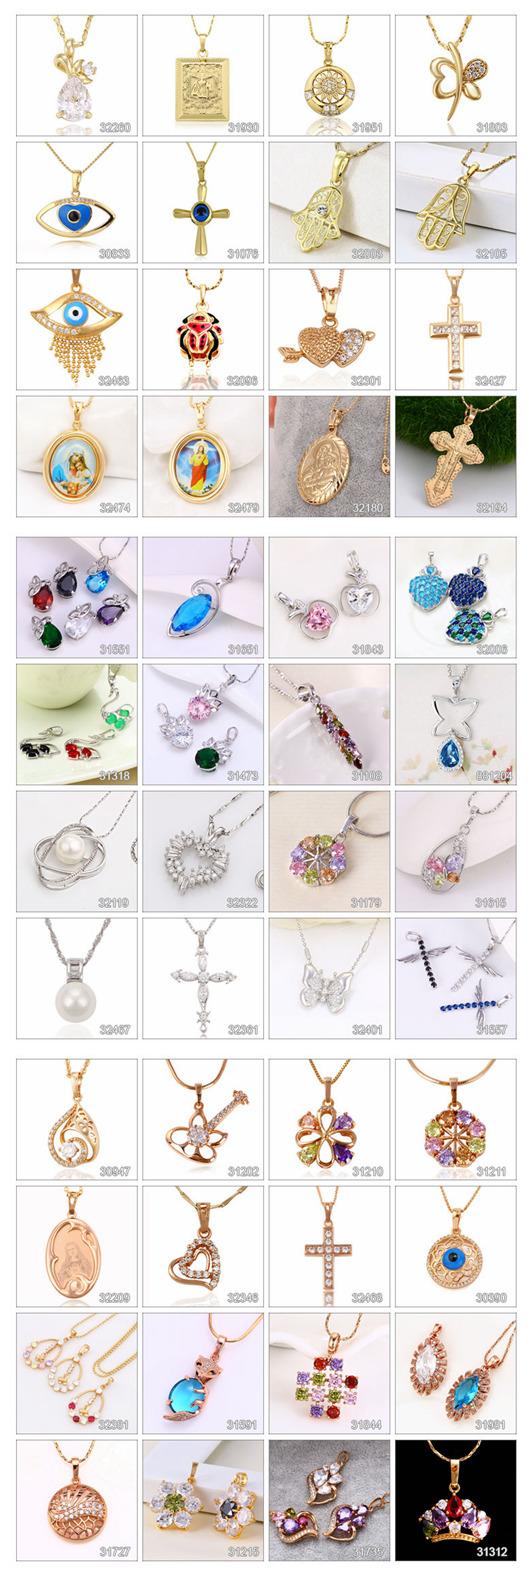 32702 Fashion Elegant Crystal Jewelry Chain Pendant in Rhodium Color